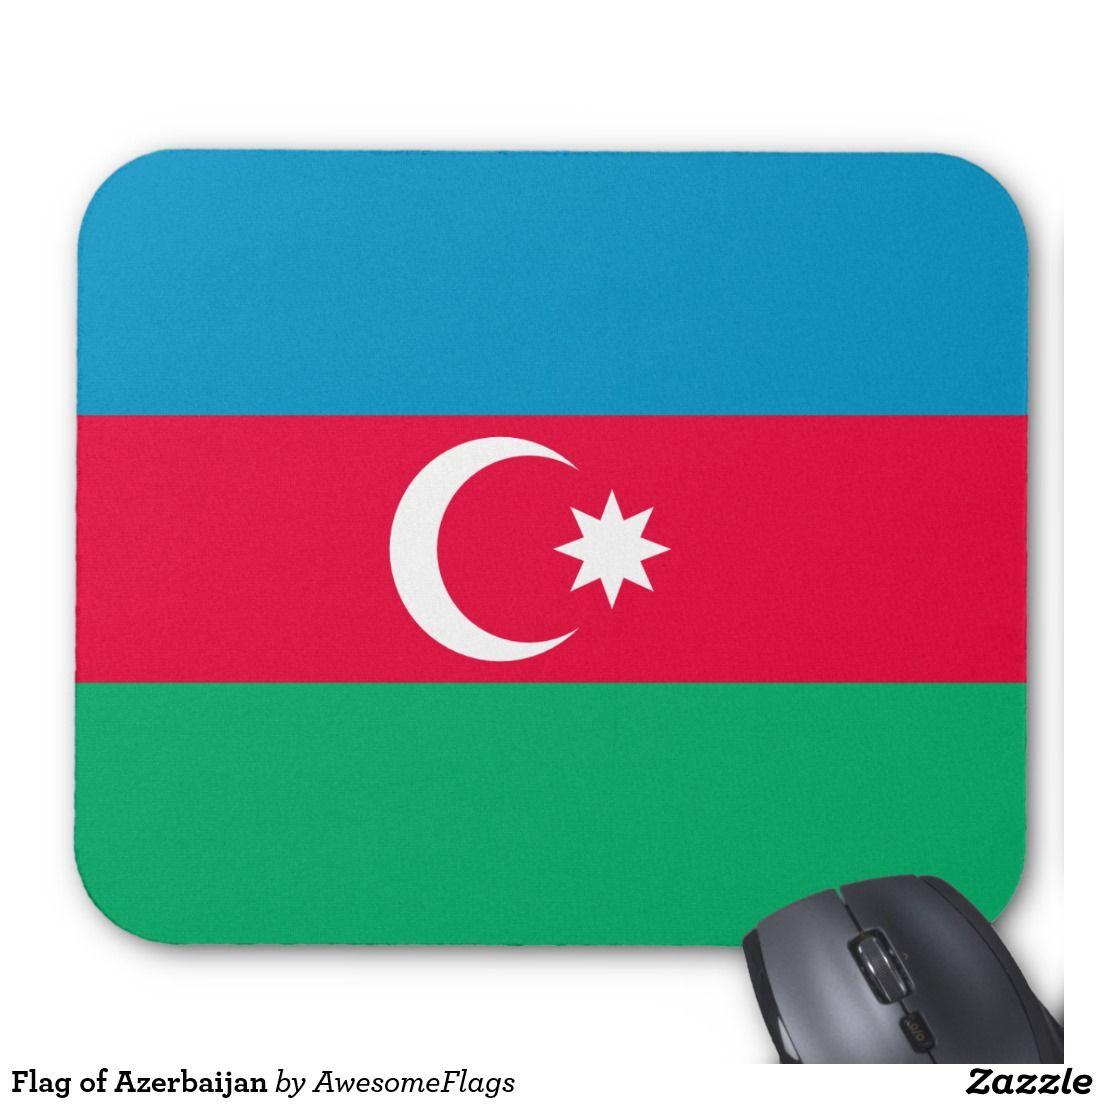 flag of azerbaijan mouse pad flag design ideas - Flag Design Ideas